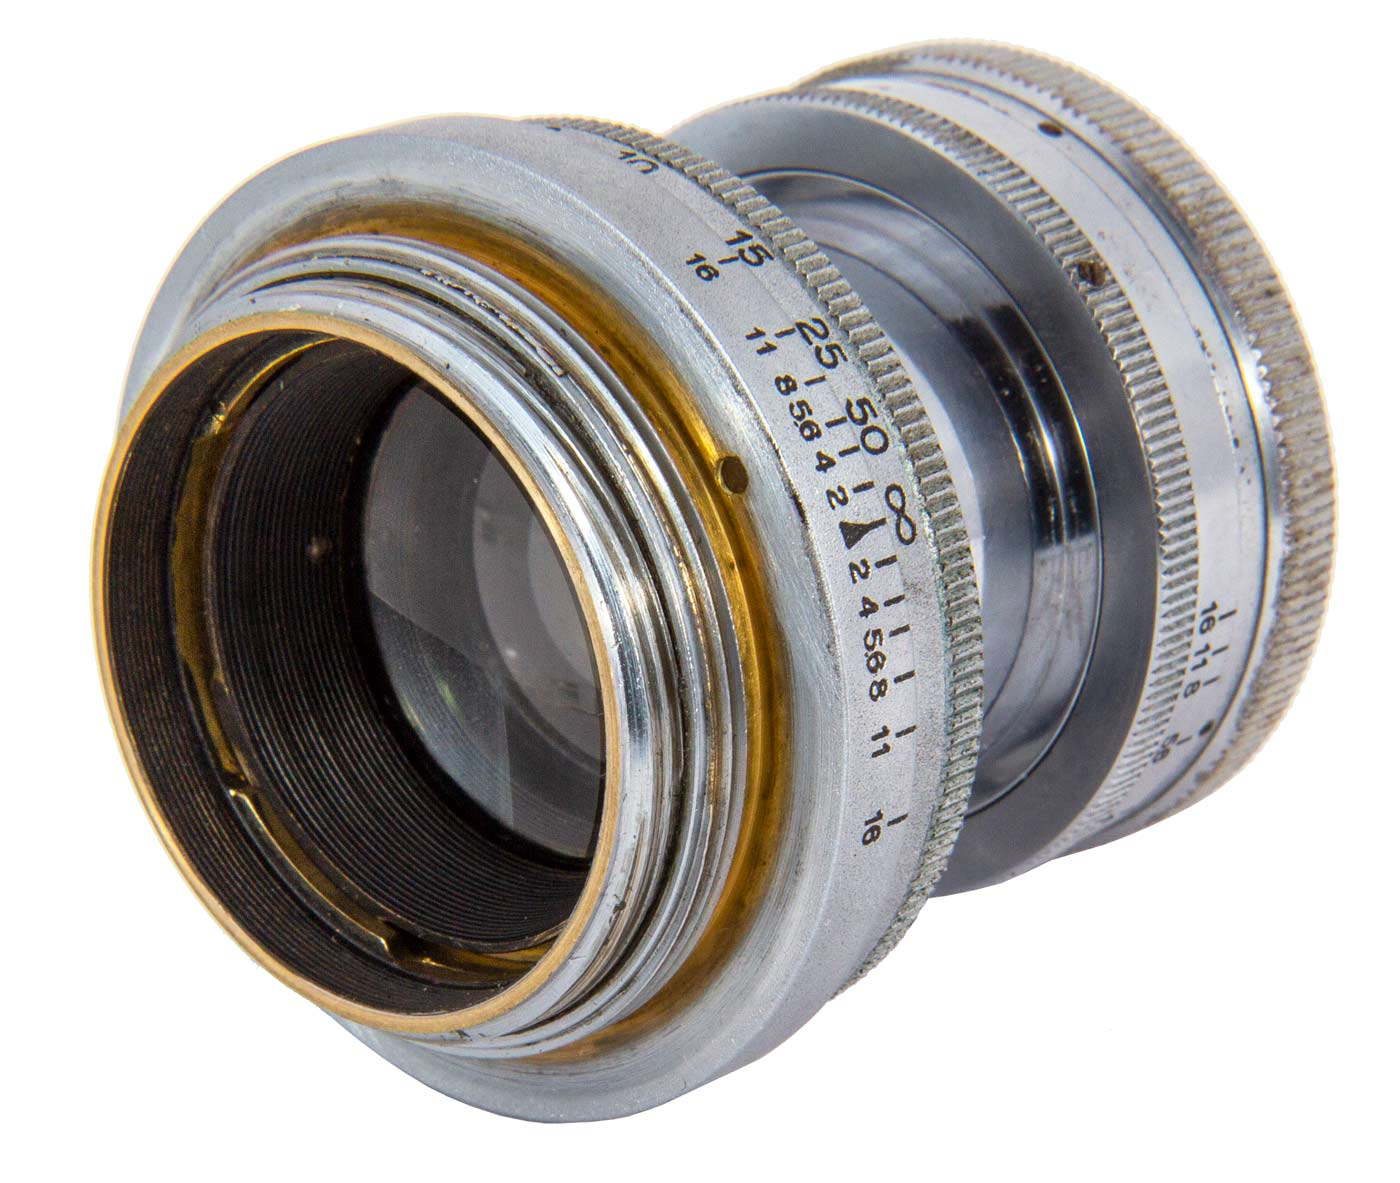 Canon Seiki-Kogaku 50mm f/2.0 Lens